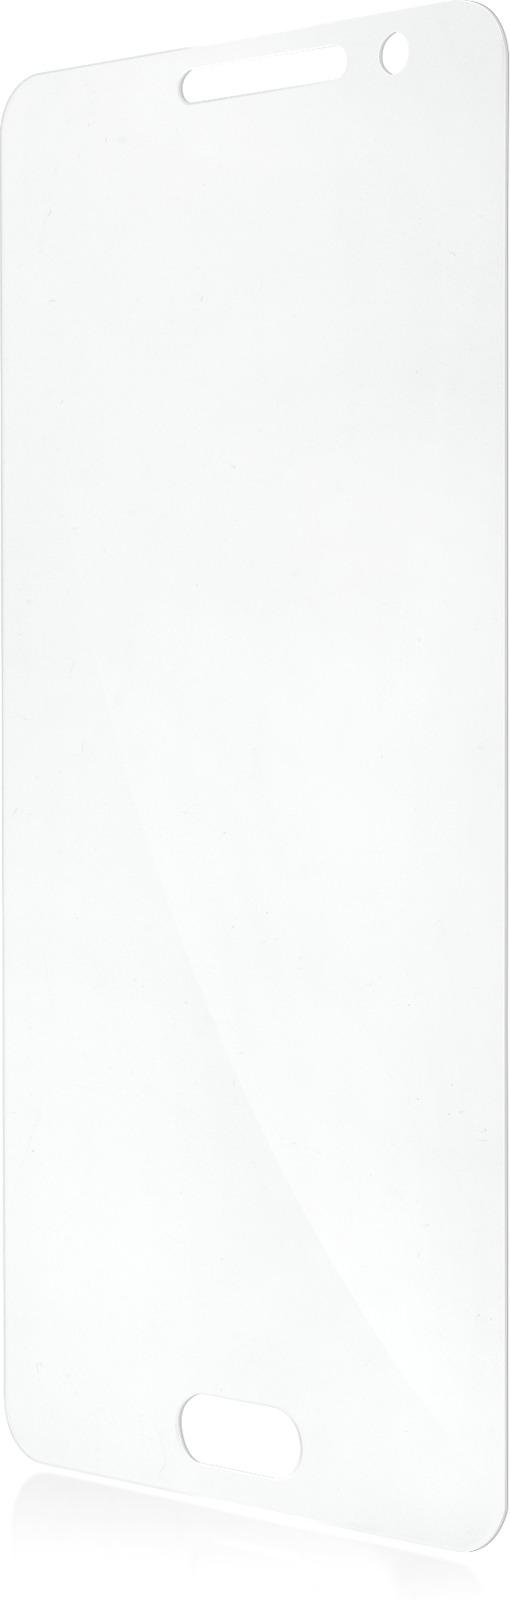 Защитное стекло Brosco для Samsung Galaxy J2 Prime, прозрачный смартфон samsung galaxy j2 prime sm g532f gold